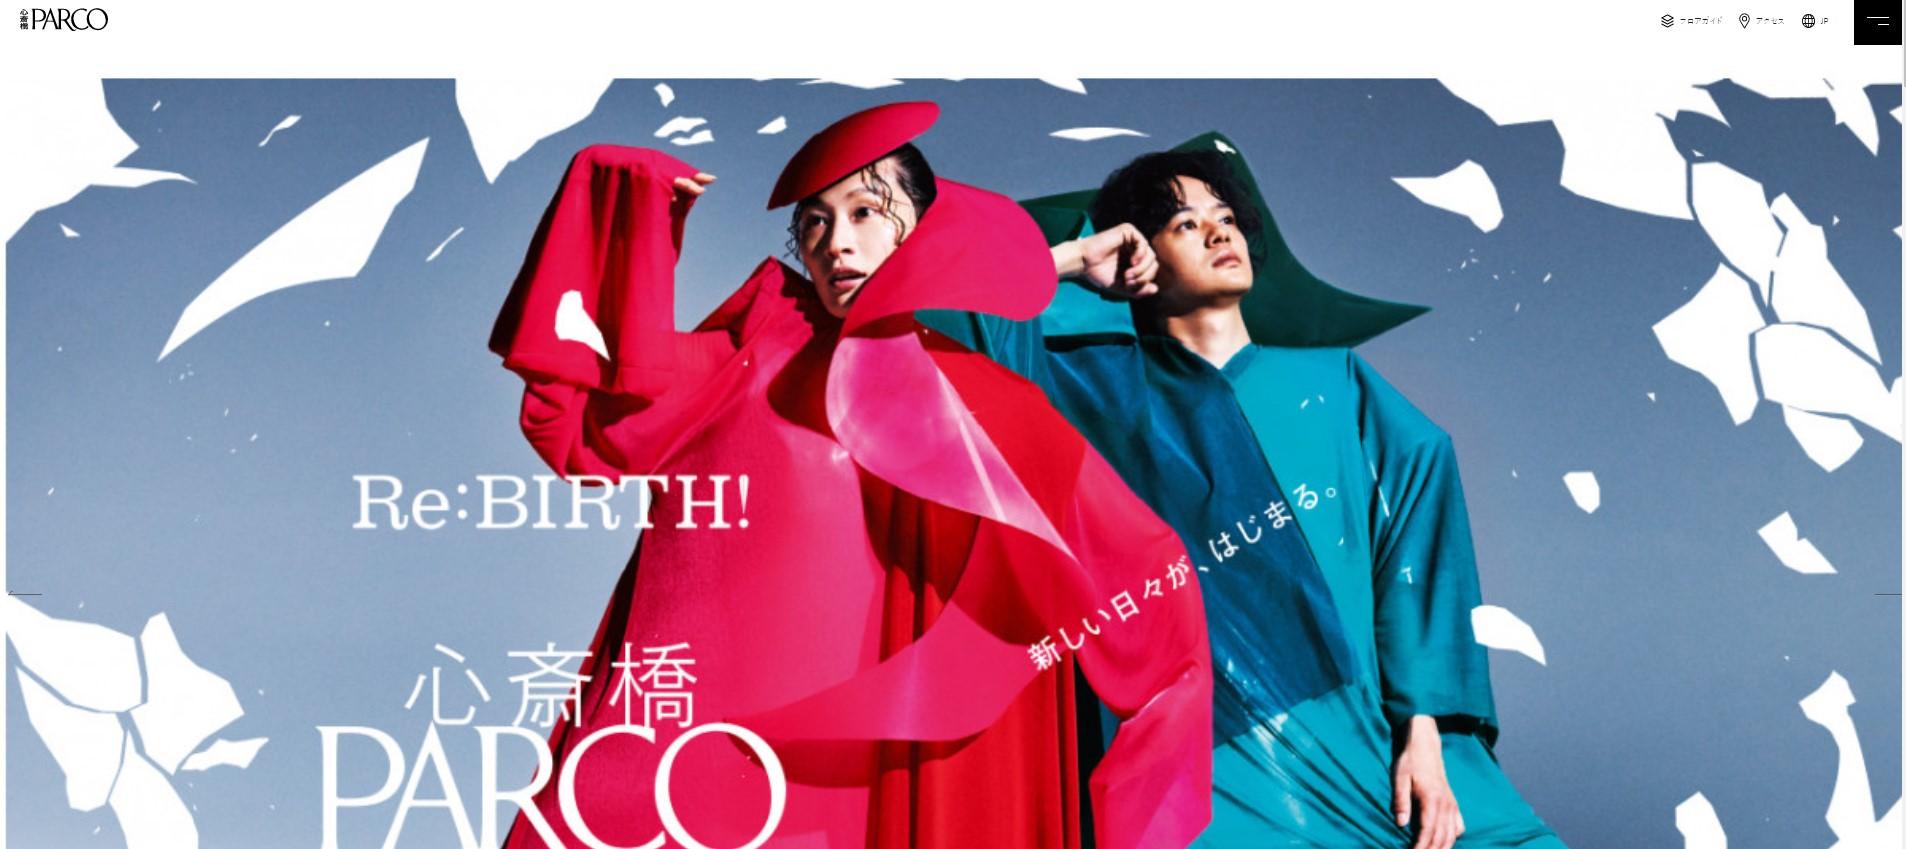 ARを活用したデジタル展示イベントを実施!心斎橋PARCOが2020年11月にオープン